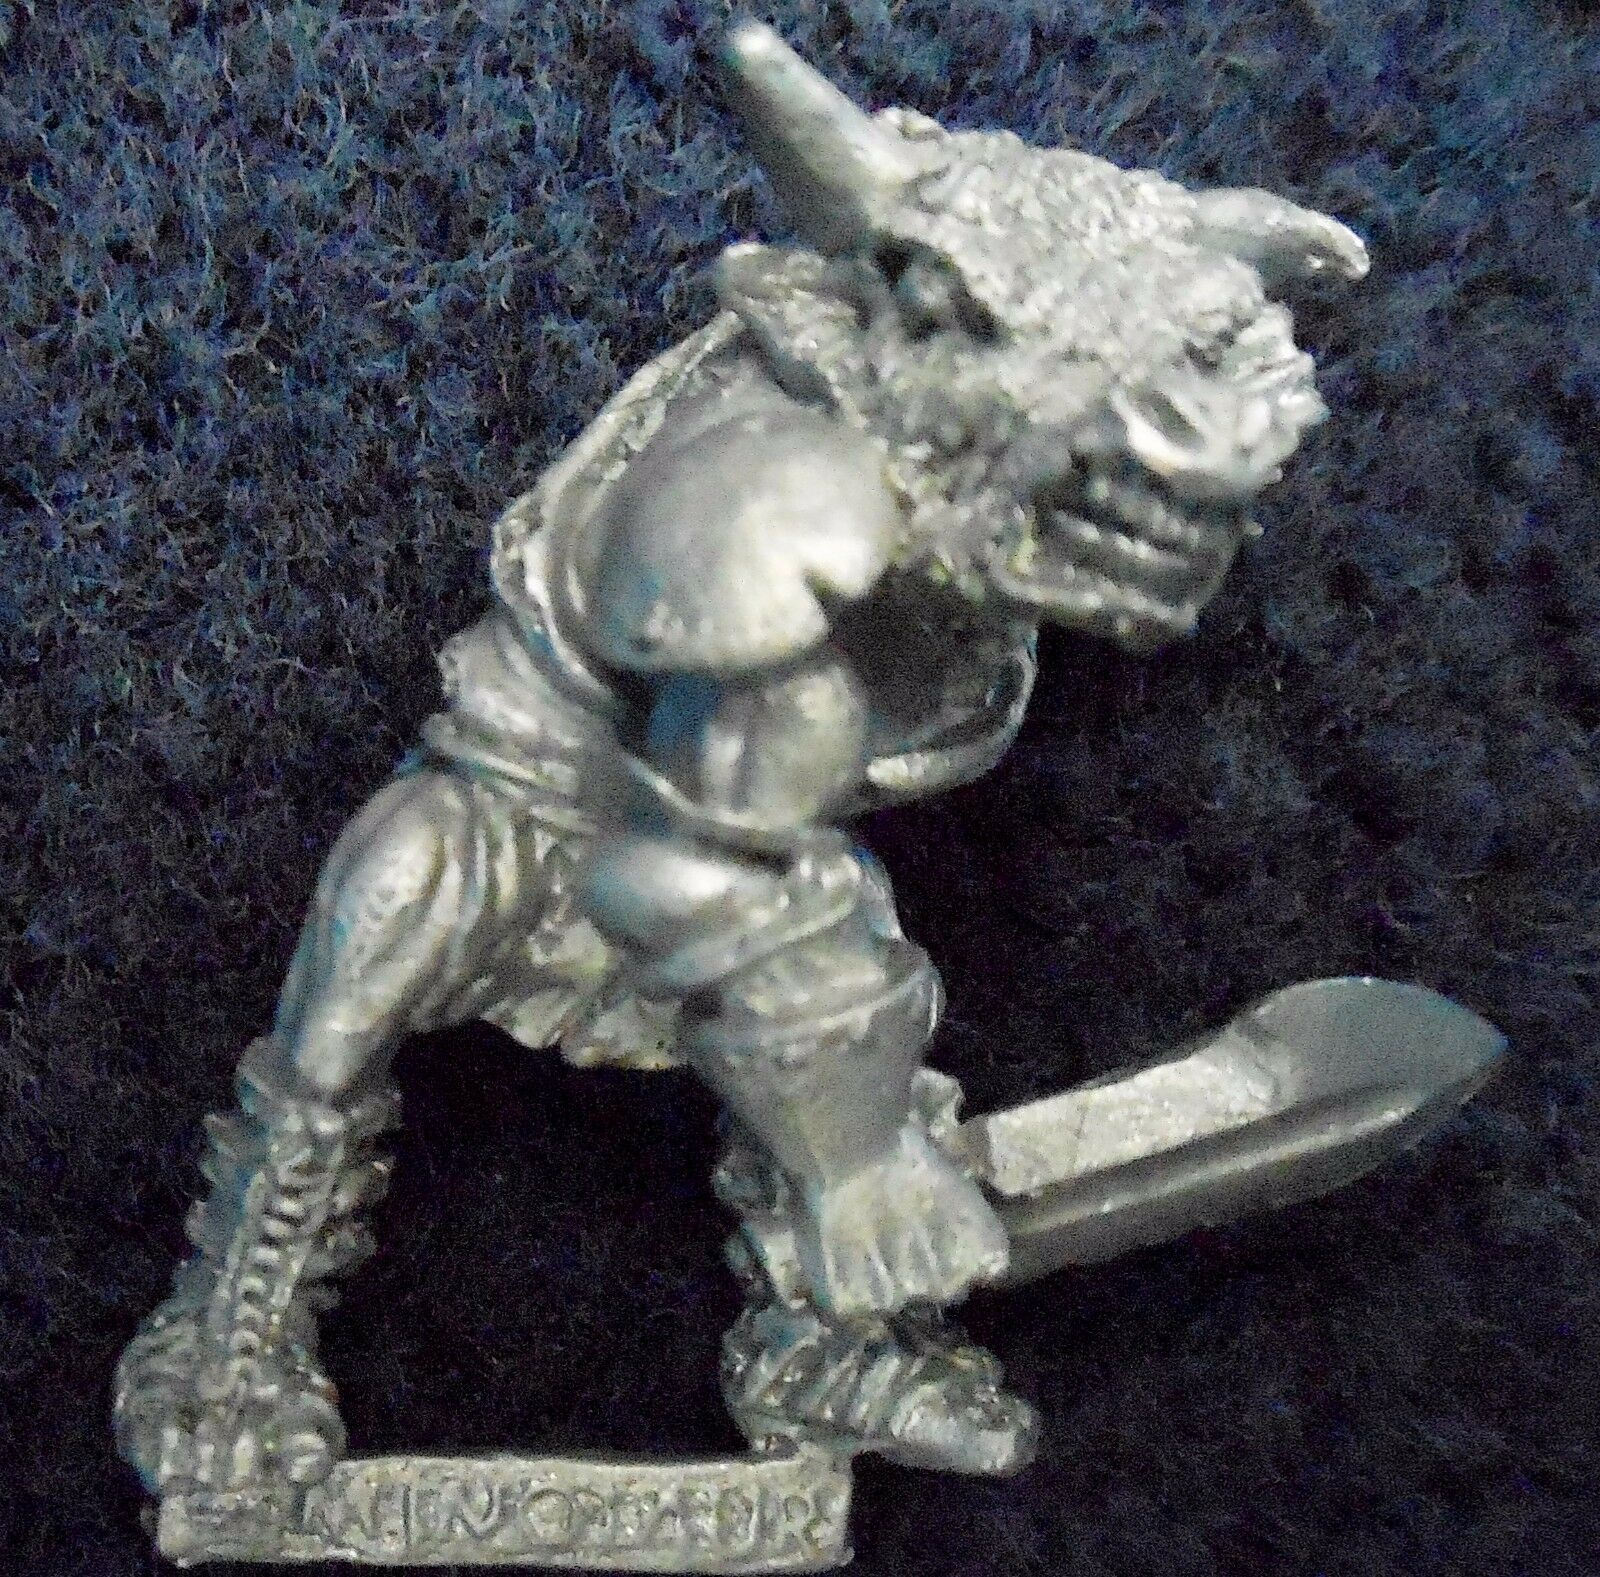 1986 Chaos Beastman Minotaur C25 Redeye Swordbreaker Citadel Warhammer Beastmen